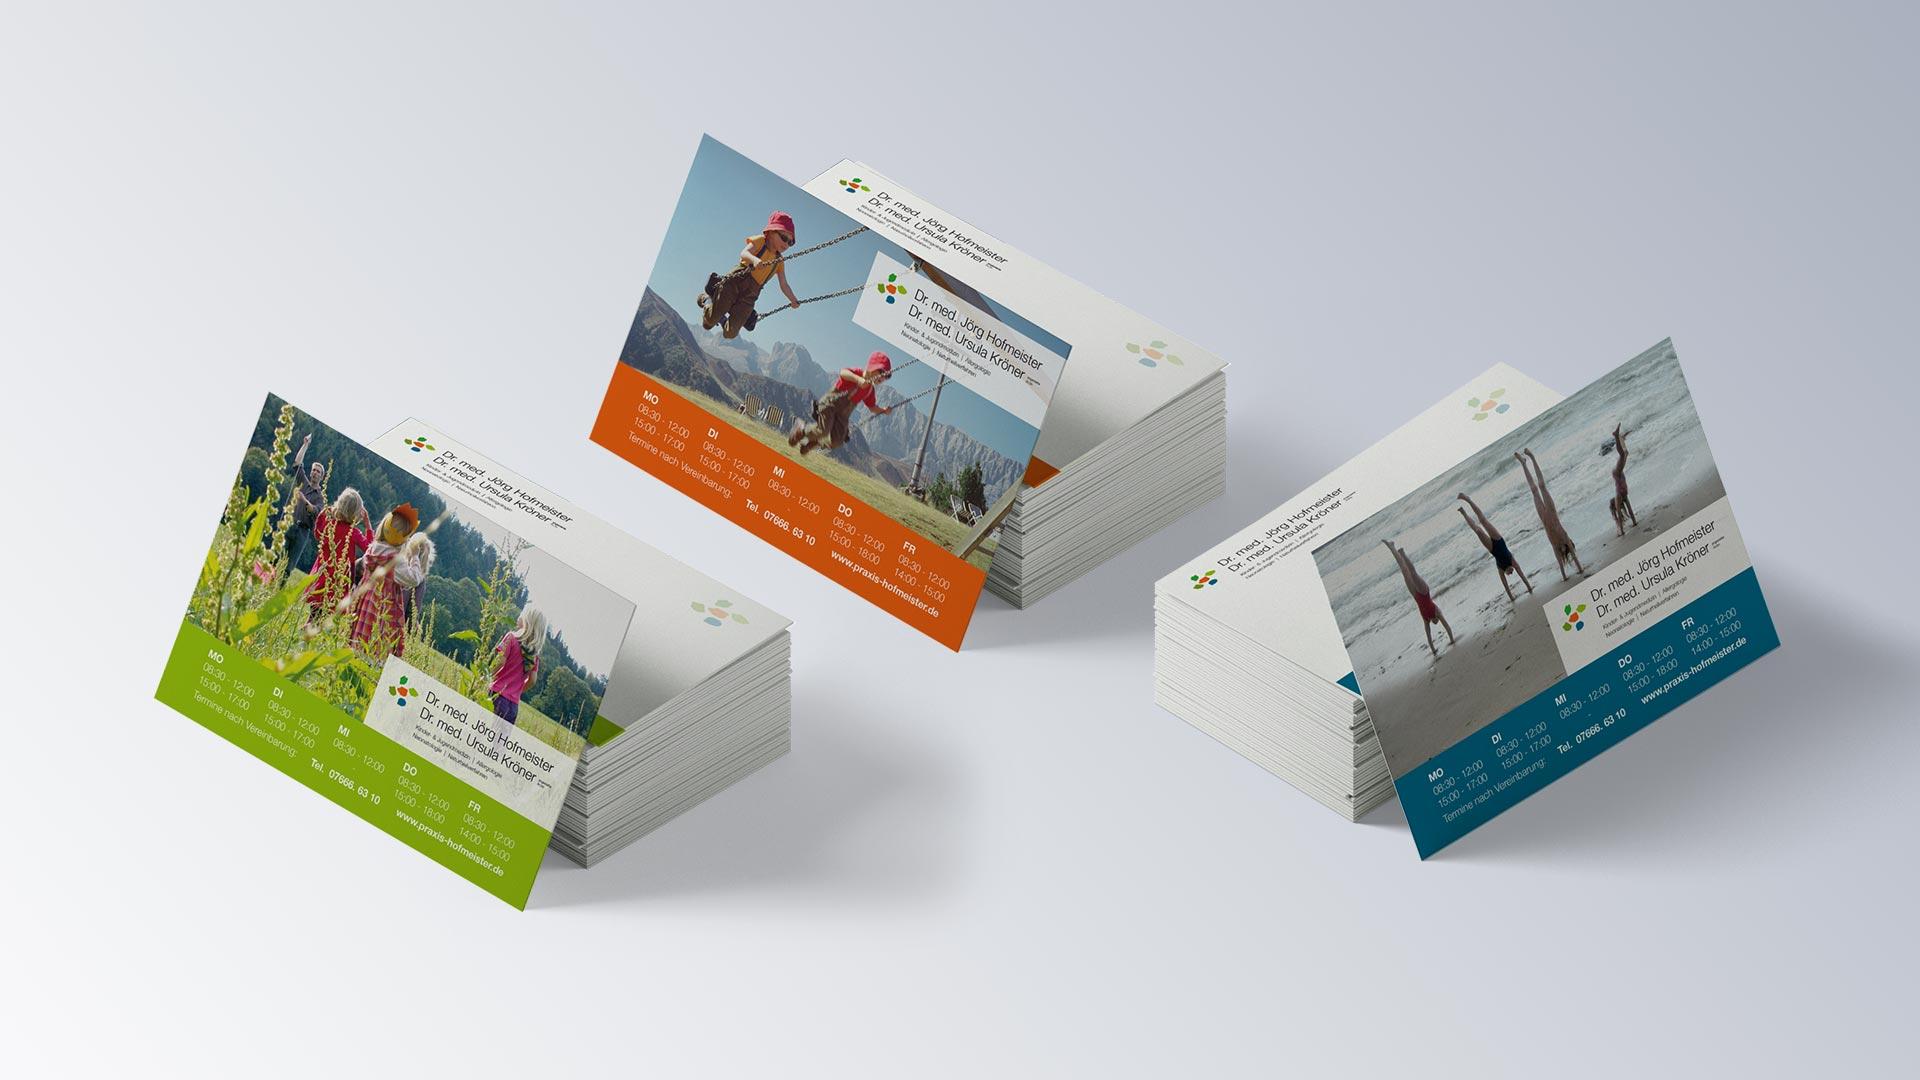 Praxis Dr. Jörg Hofmeister Kinderarzt Denzlingen Karten Postkarten